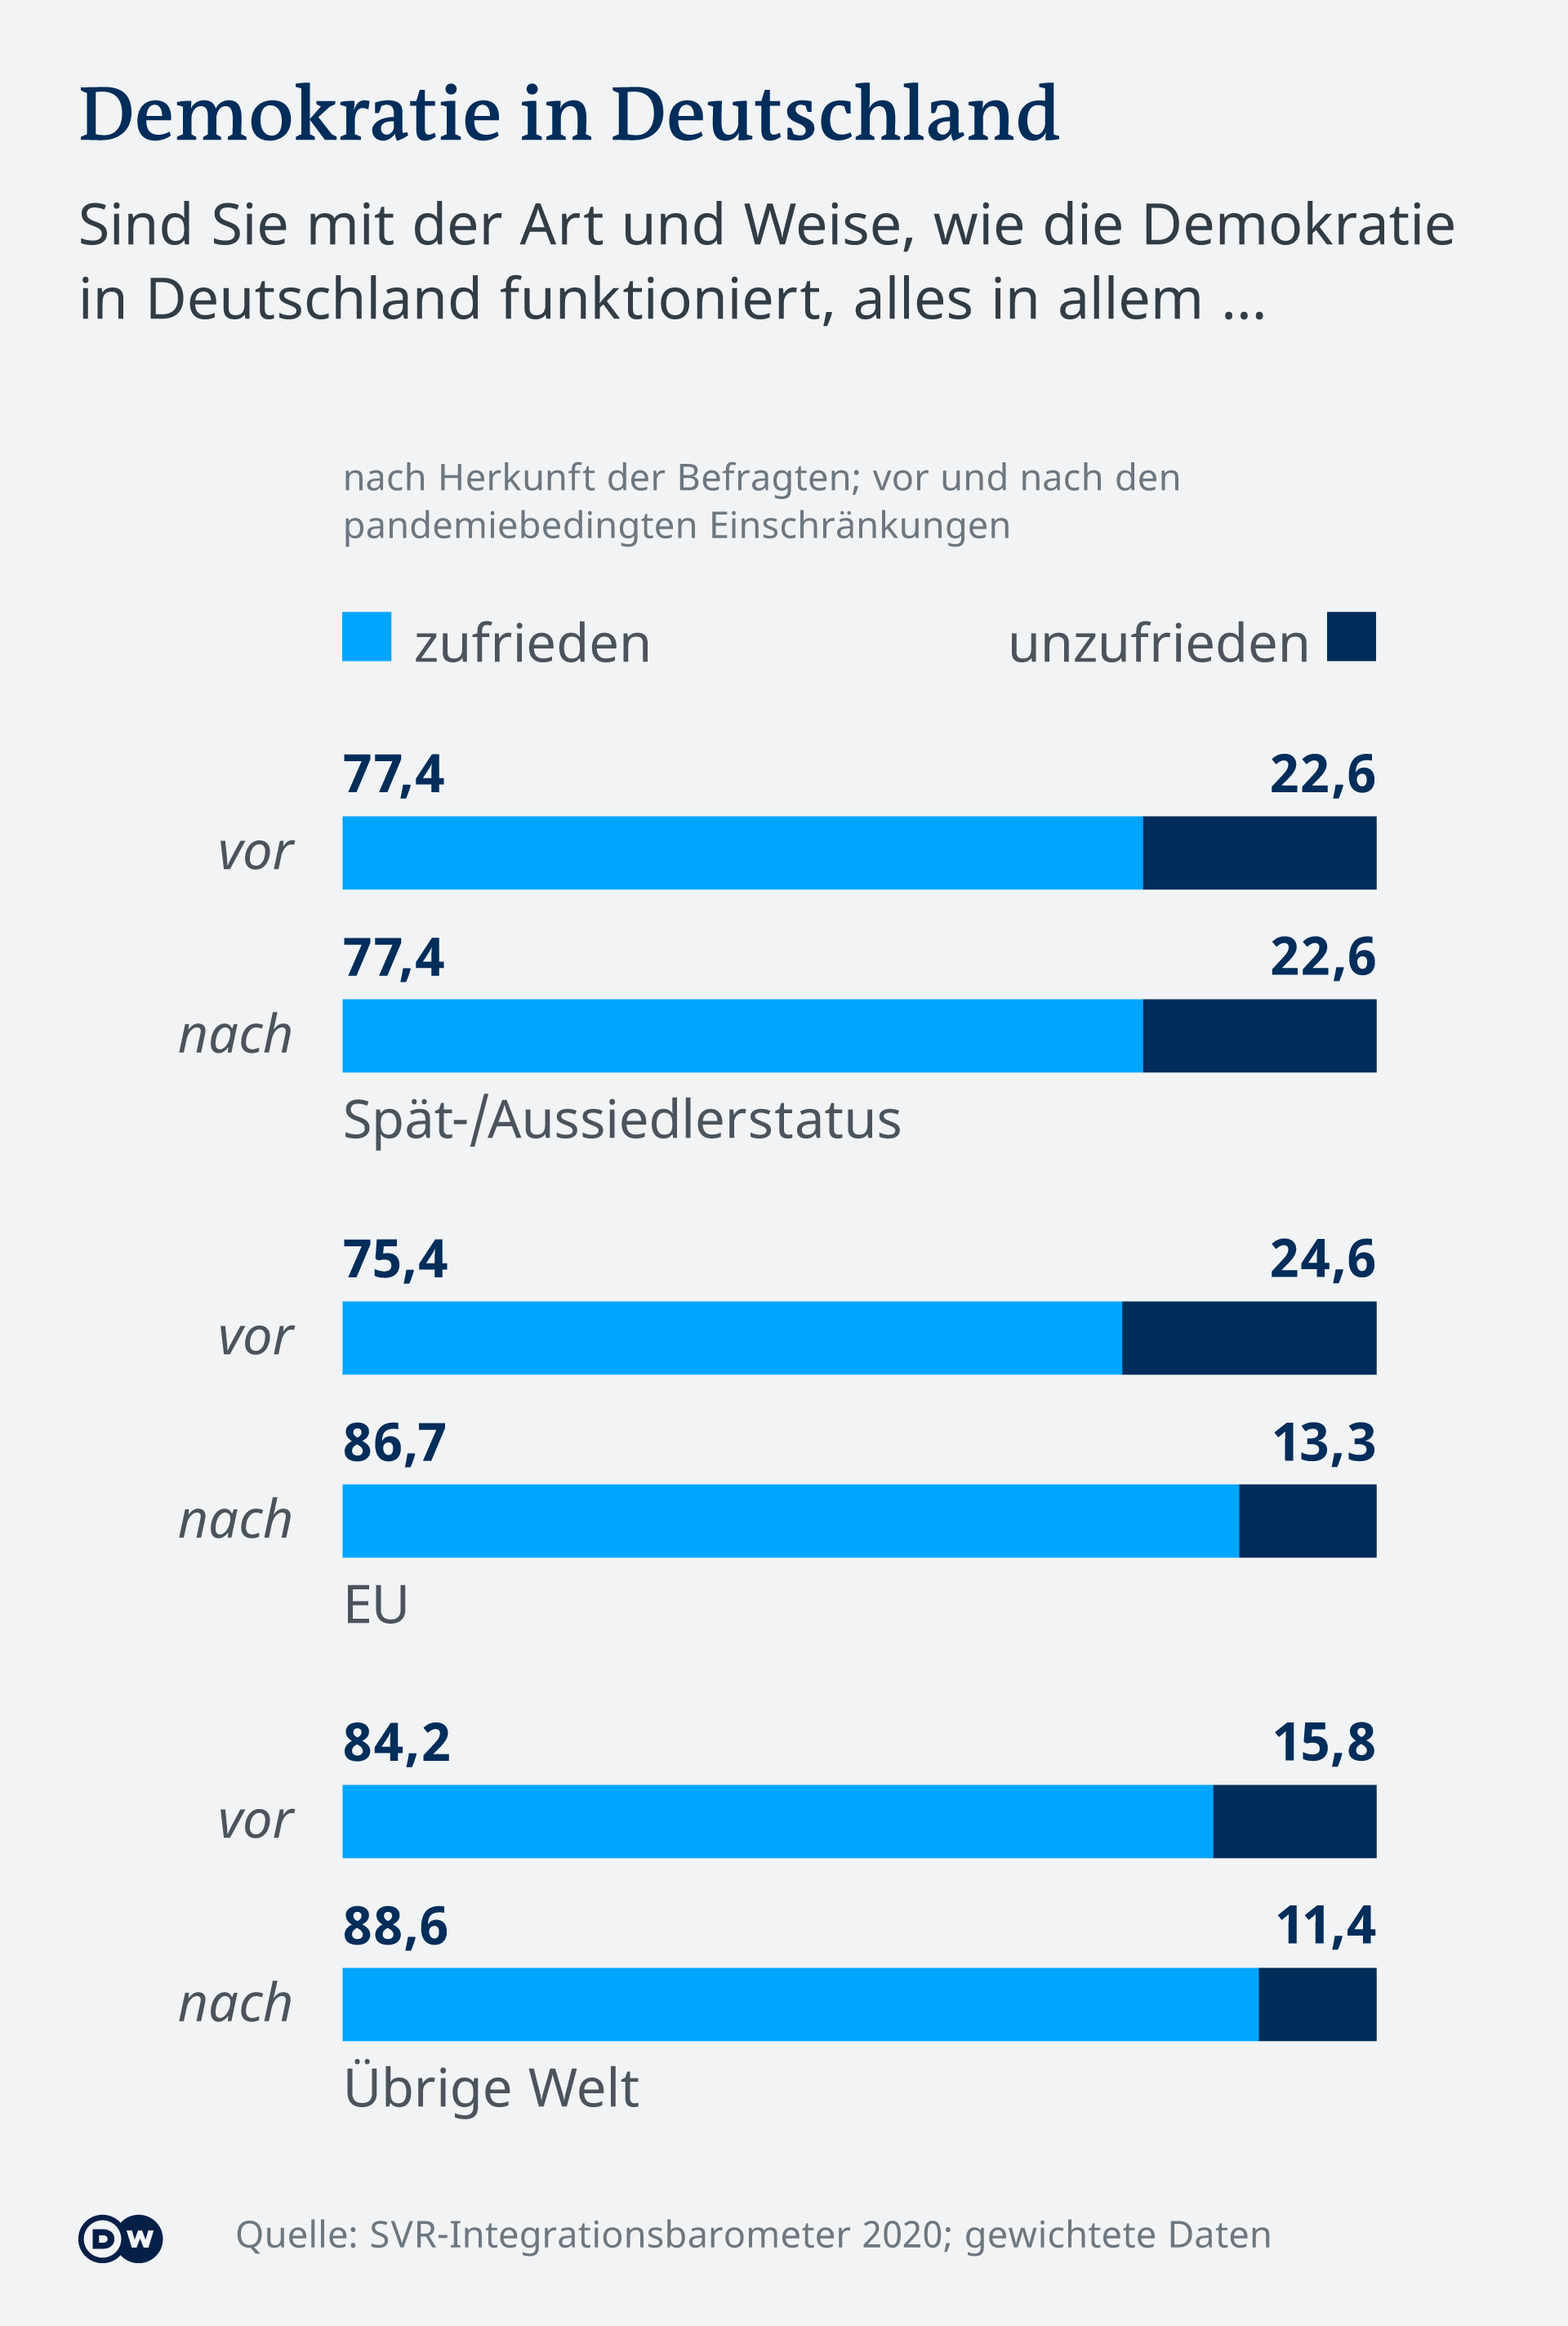 Infografik SVR-Integrationsbarometer 2020 Demokratie in Deutschland DE (Sperrfrist: 9.12.20, 10:30)